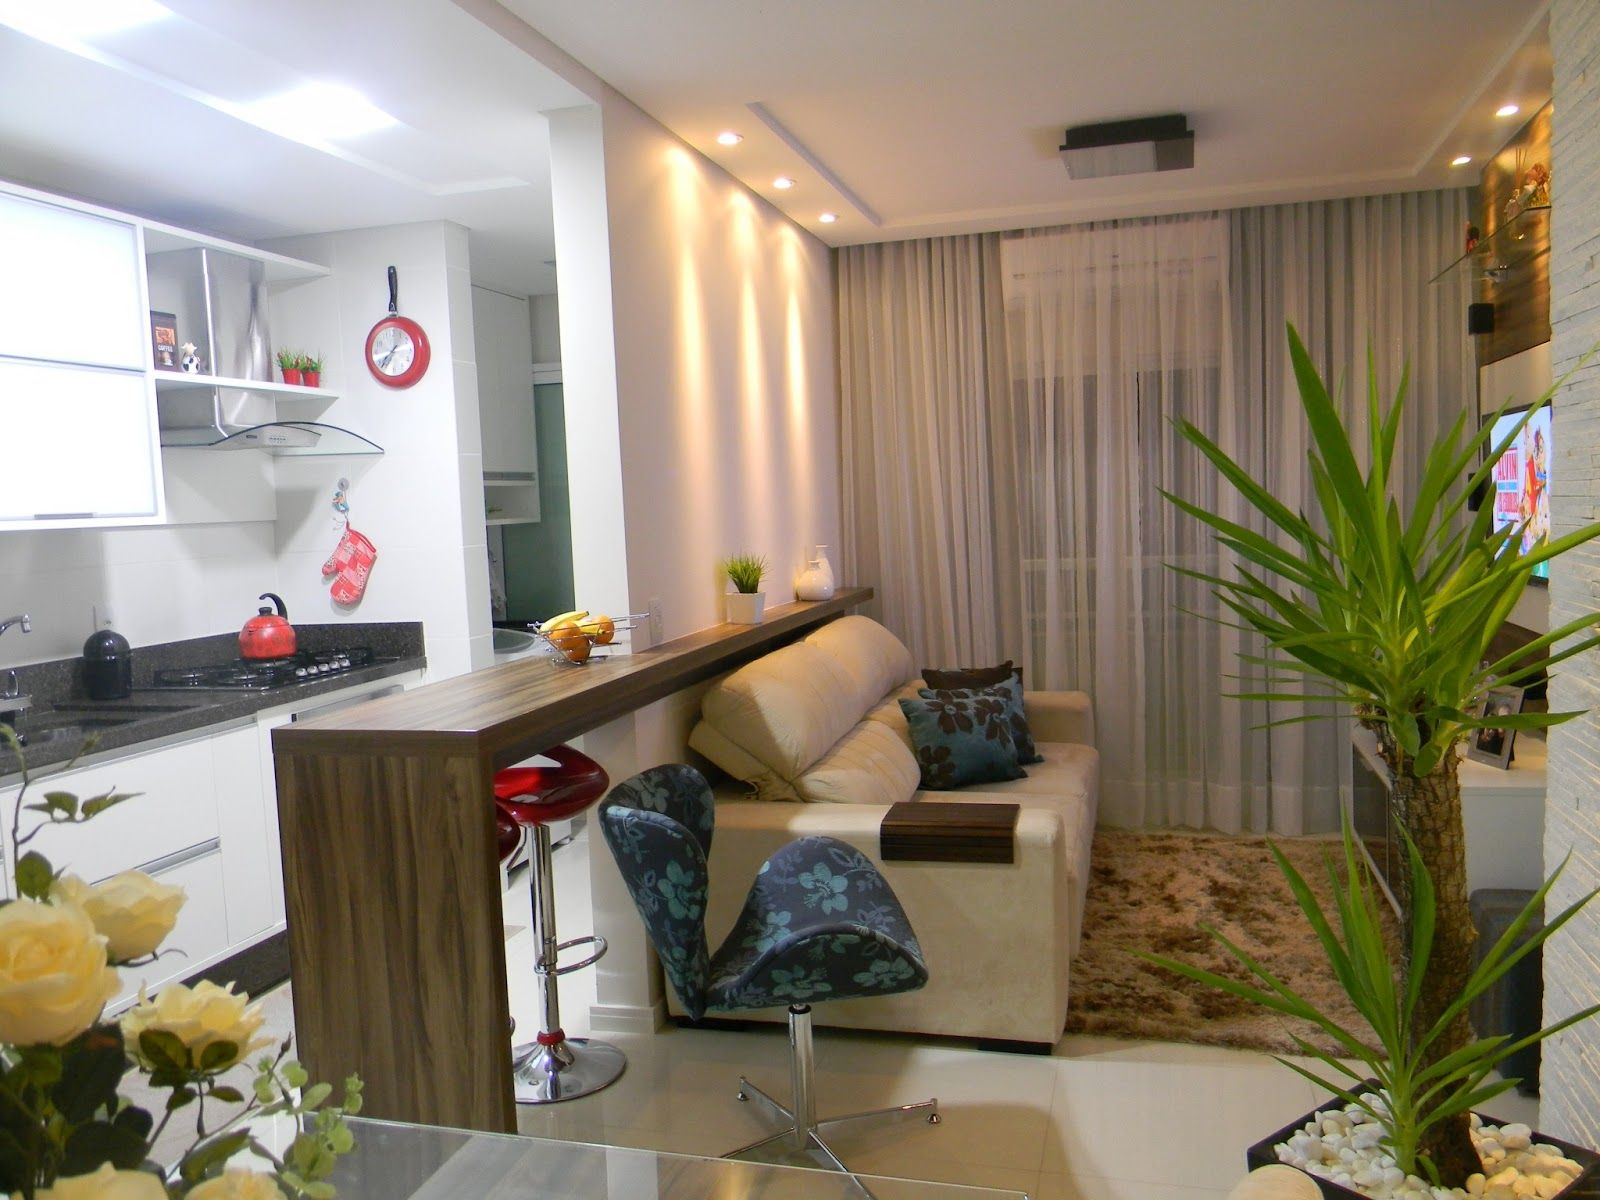 Dscn6438 Jpg 1600 1200 Pinterest Cozinha Salas E